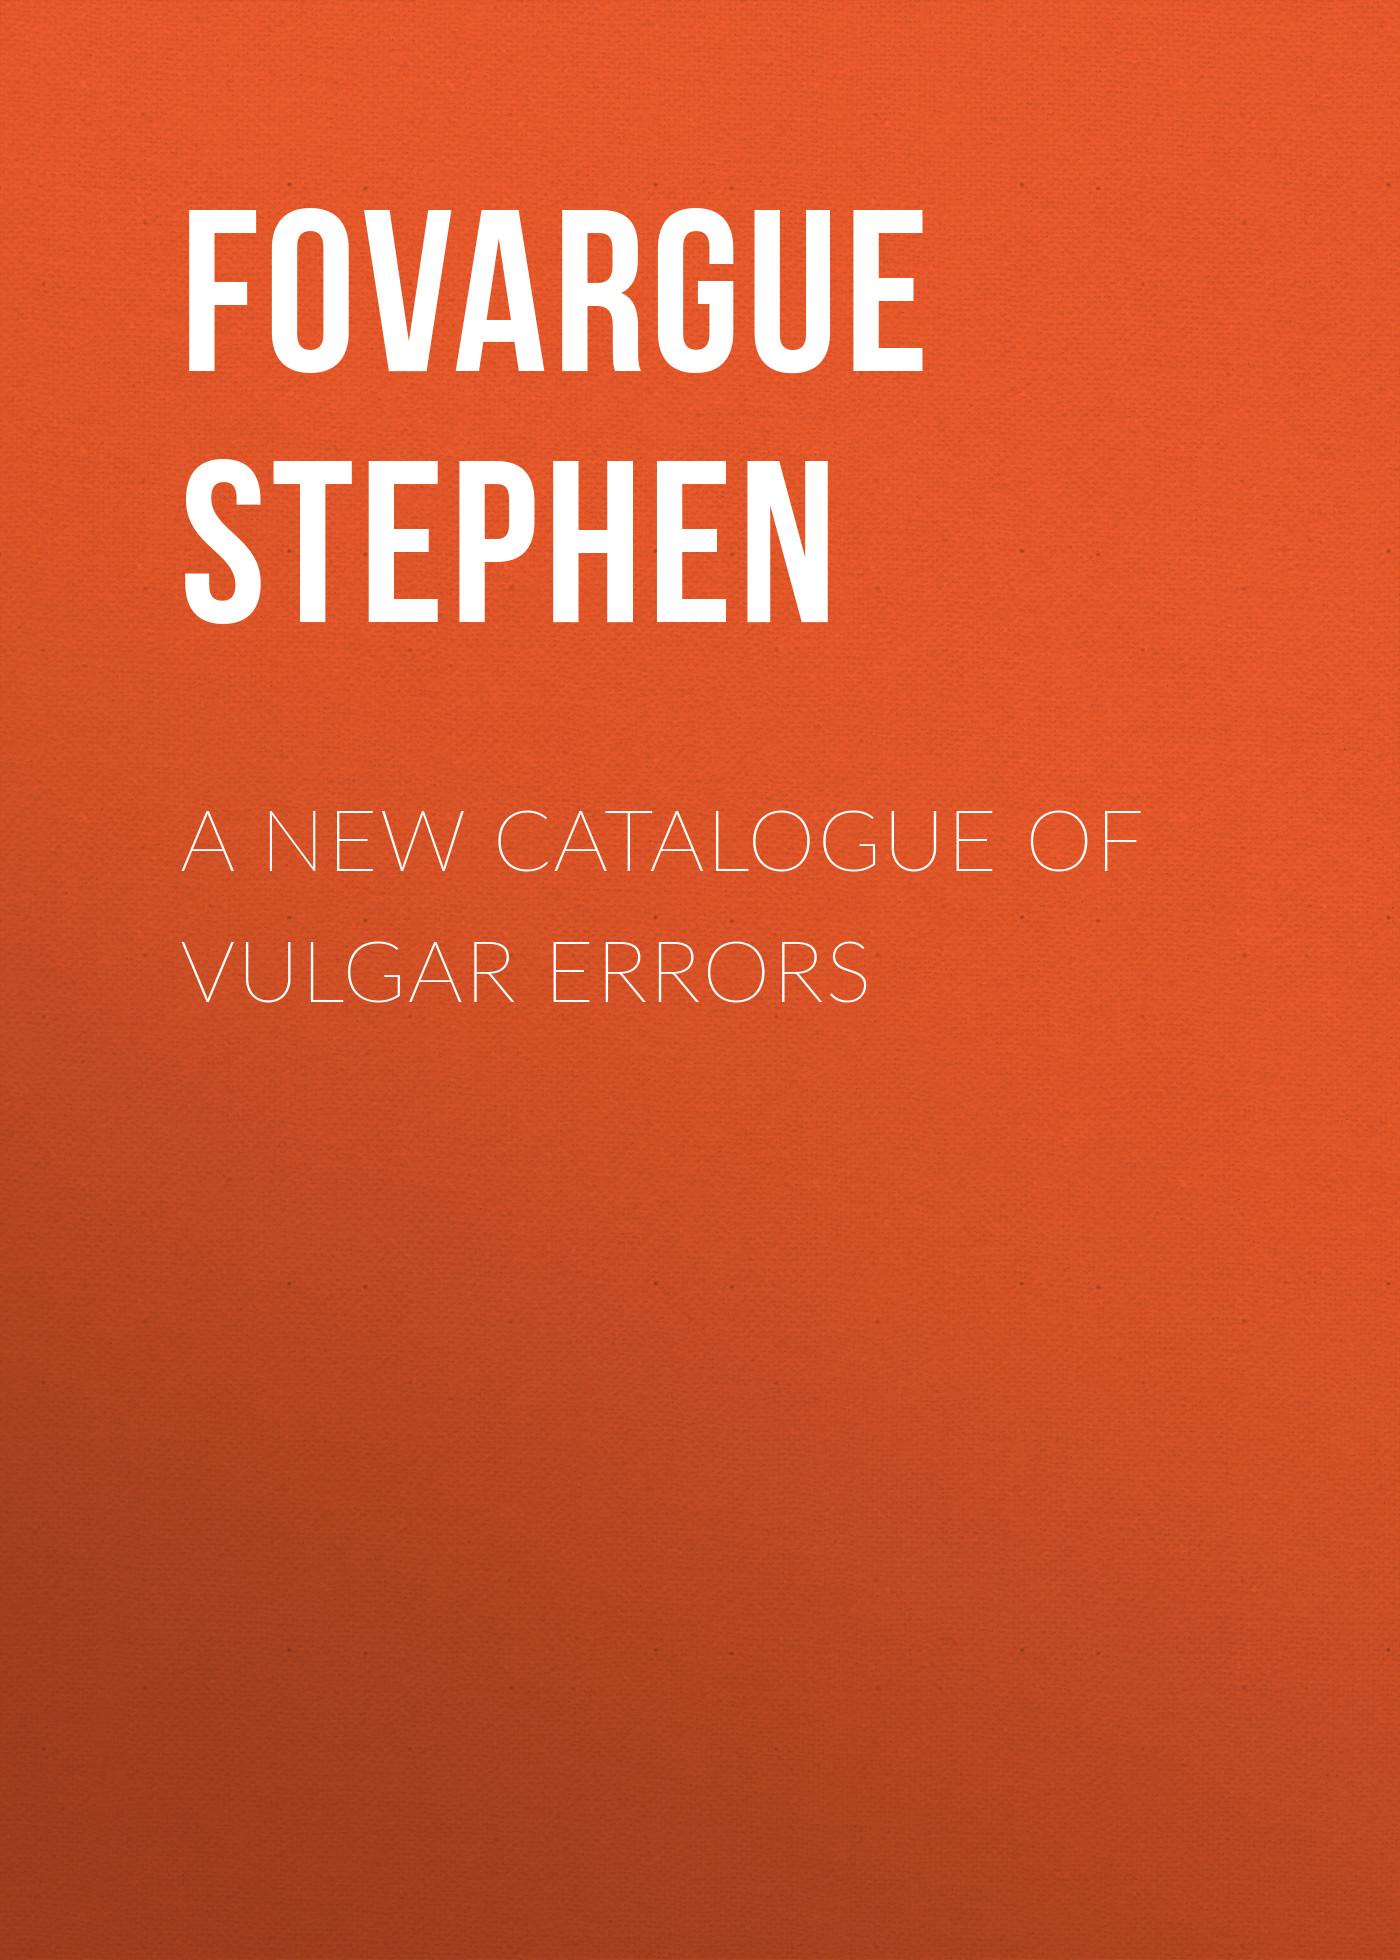 Fovargue Stephen A New Catalogue of Vulgar Errors